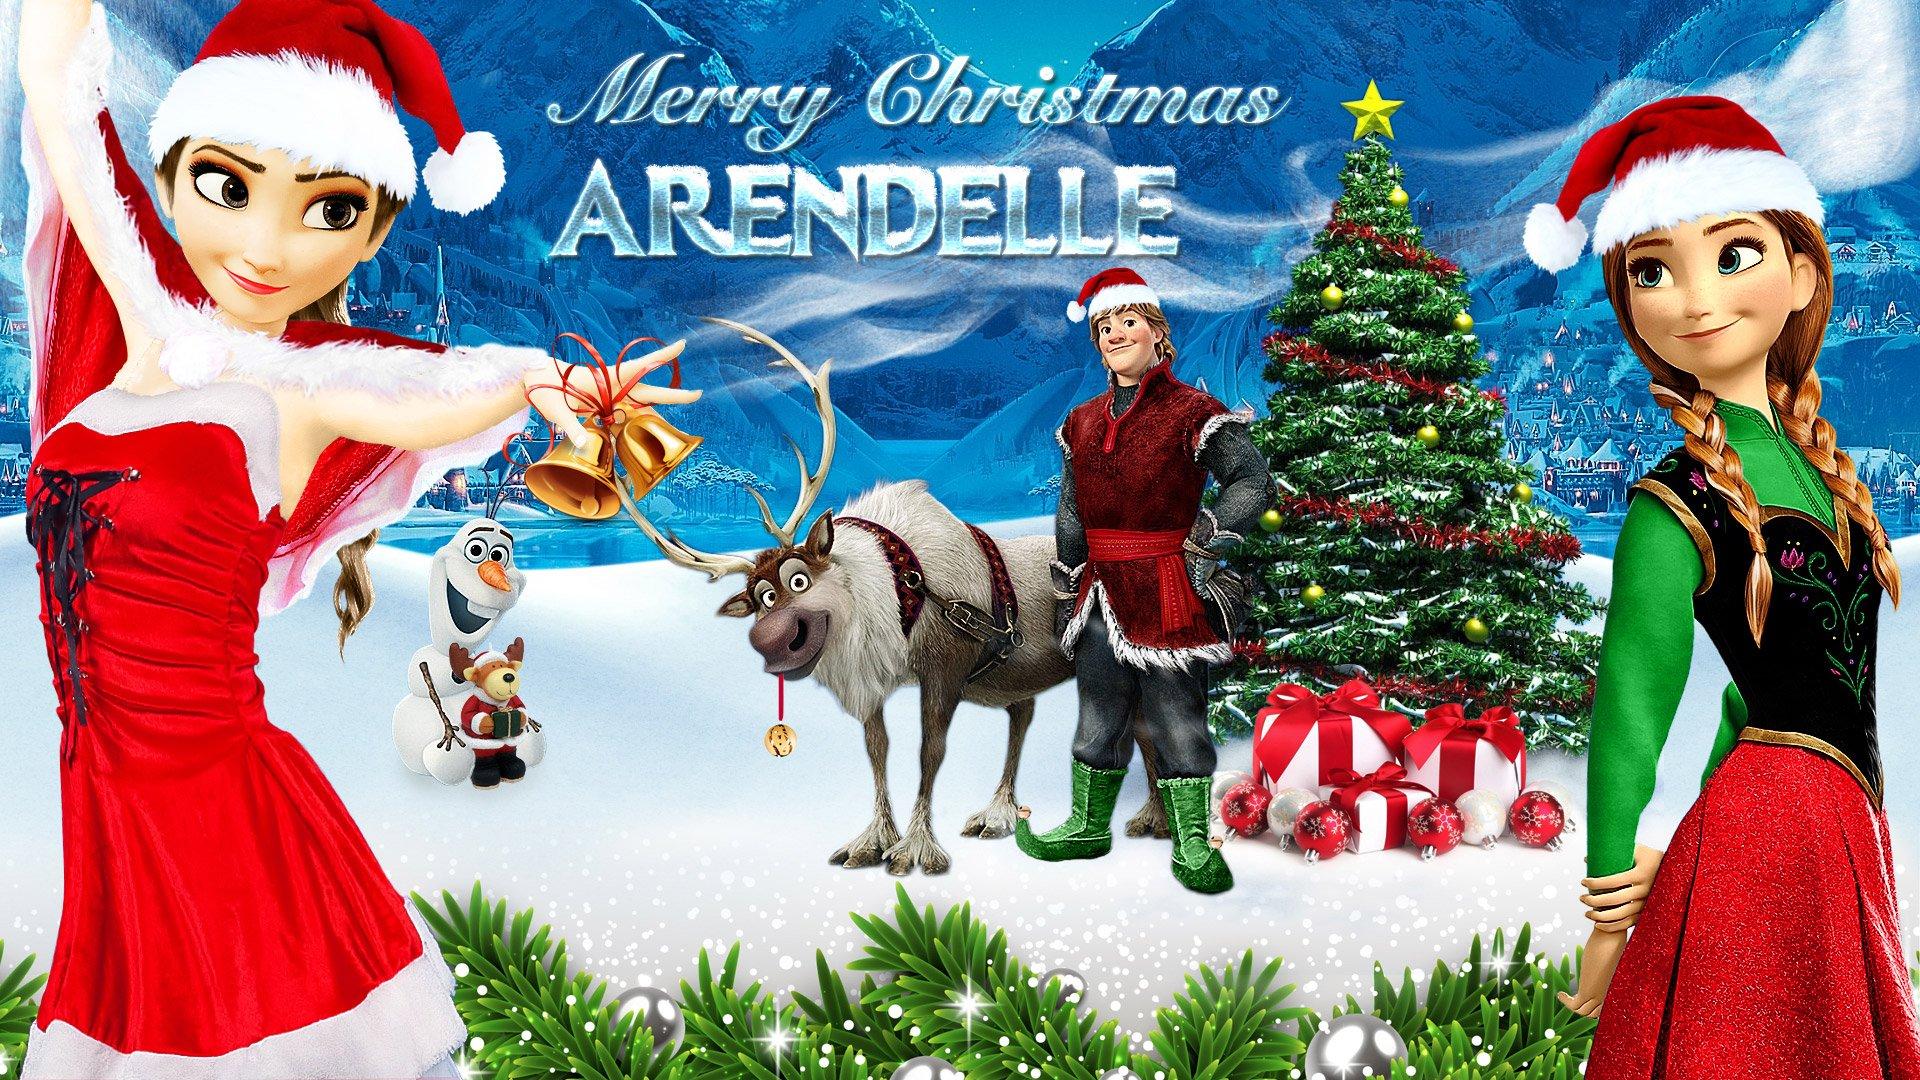 CHRISTMAS holiday frozen wallpaper 1920x1080 554901 WallpaperUP 1920x1080